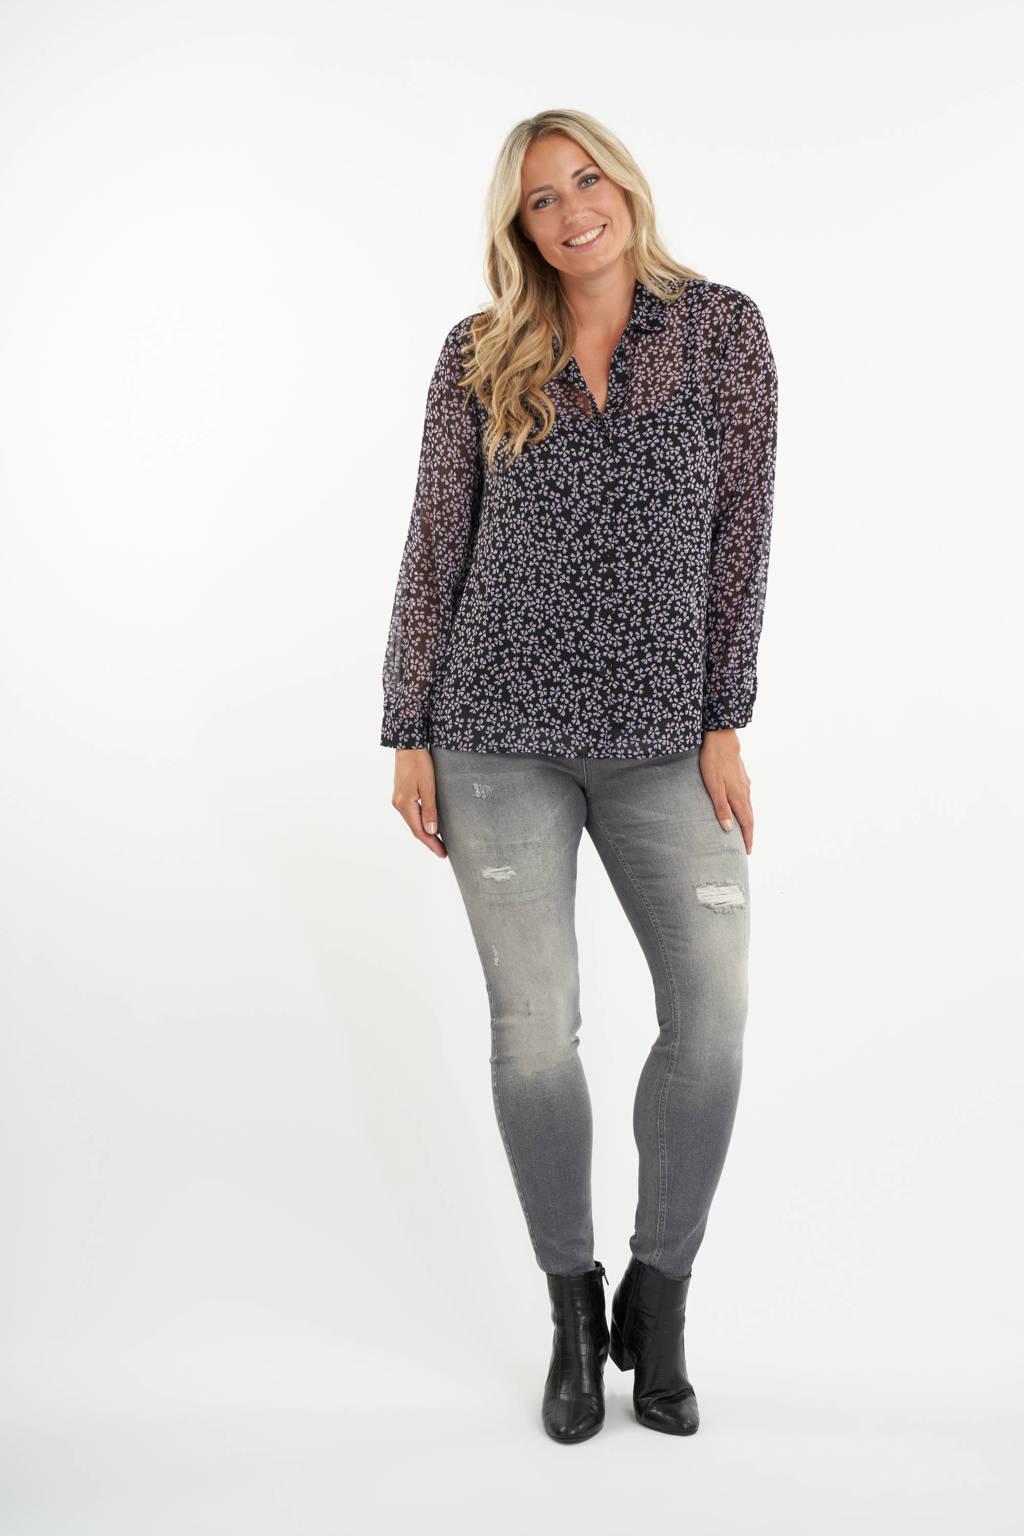 MS Mode gebloemde semi-transparante geweven blouse zwart/lila/wit, Zwart/lila/wit